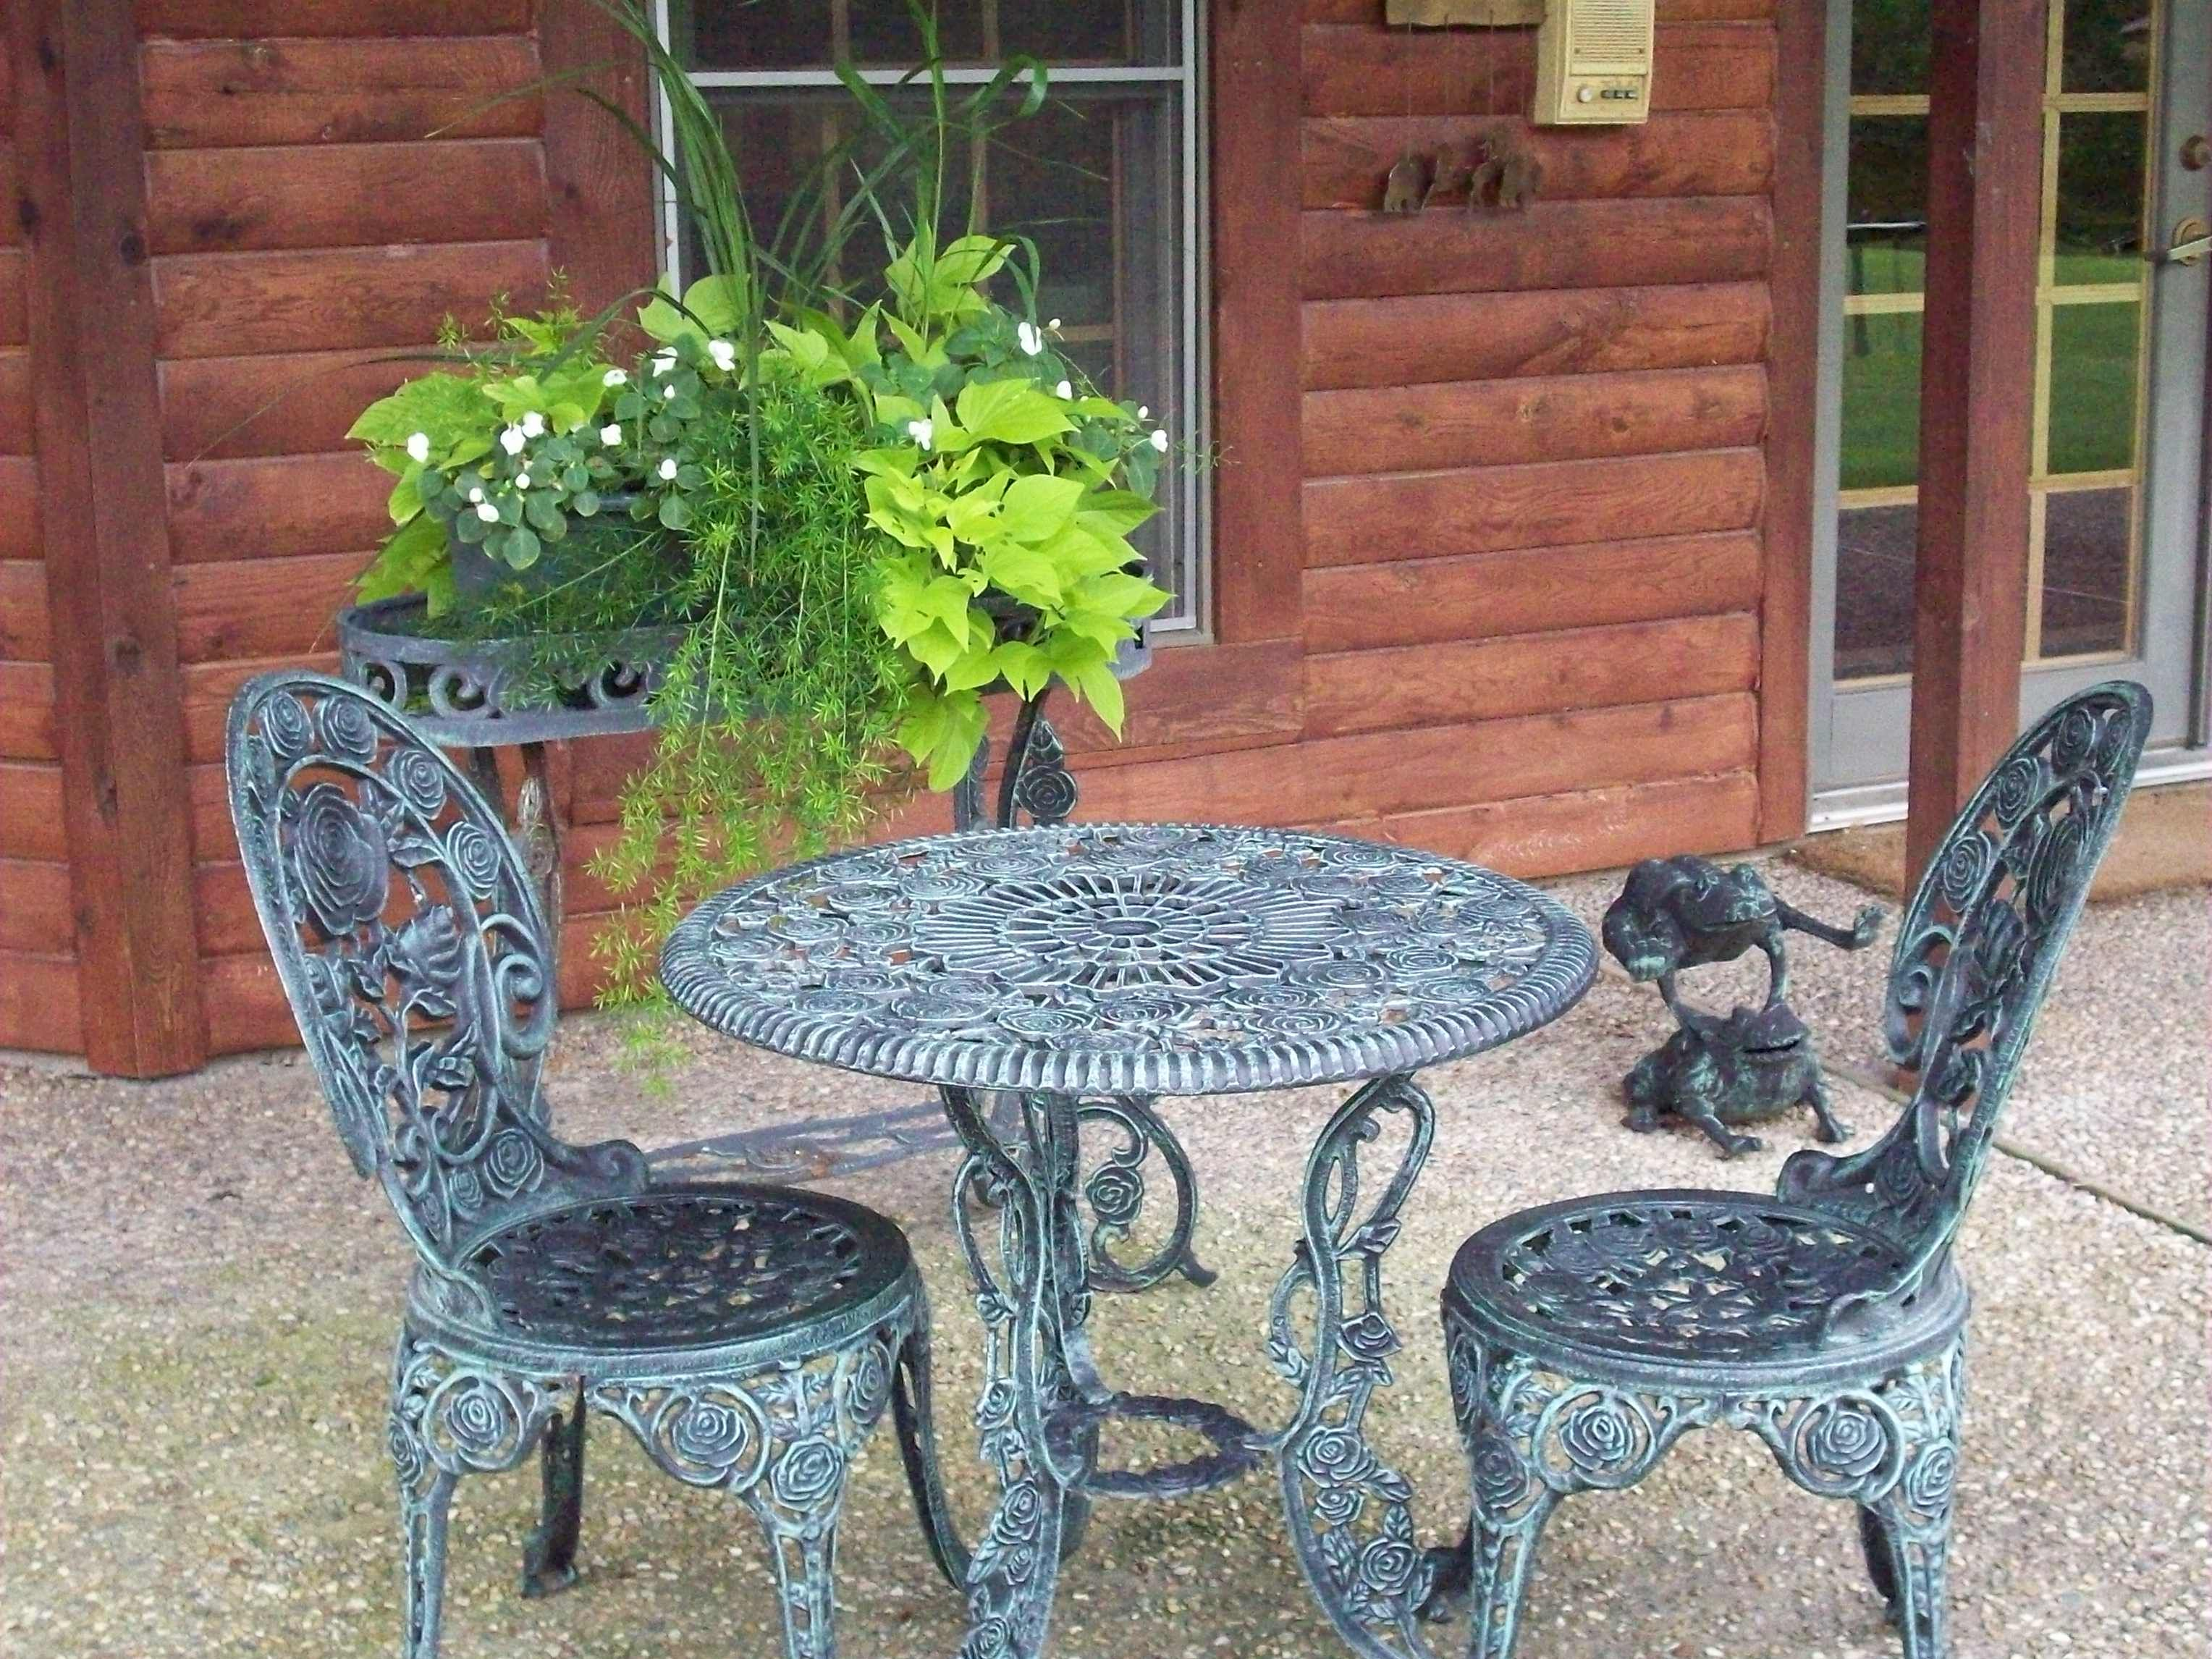 Illinois Bed & Breakfast Romantic Vacation Getaways In IL